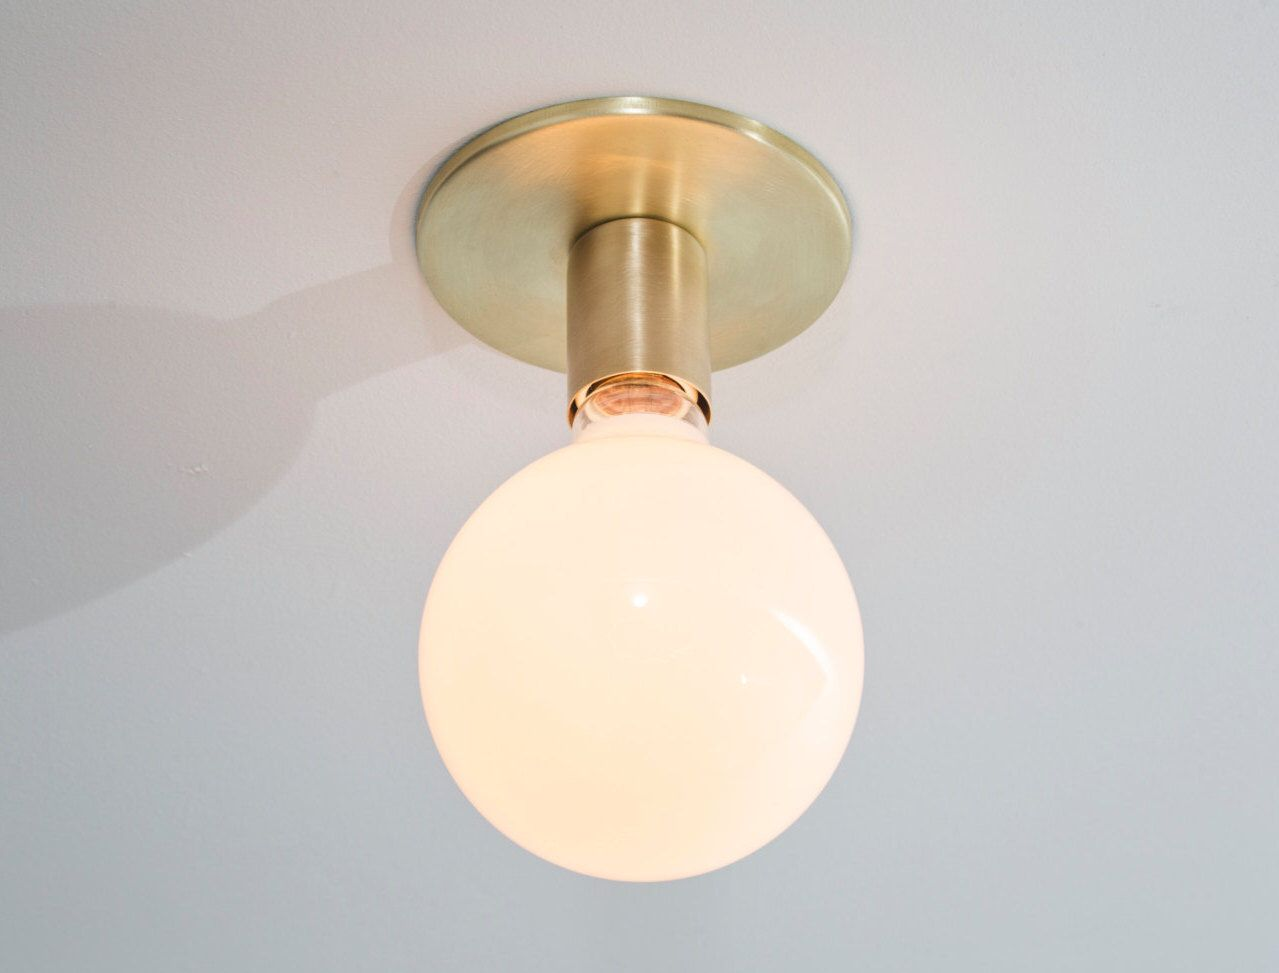 Brass Flush Mount Ceiling Light Or Wall Sconce Brass Lighting Minimalist Design Mid Century Modern Brass Ceiling Light Globe Ceiling Light Ceiling Lights